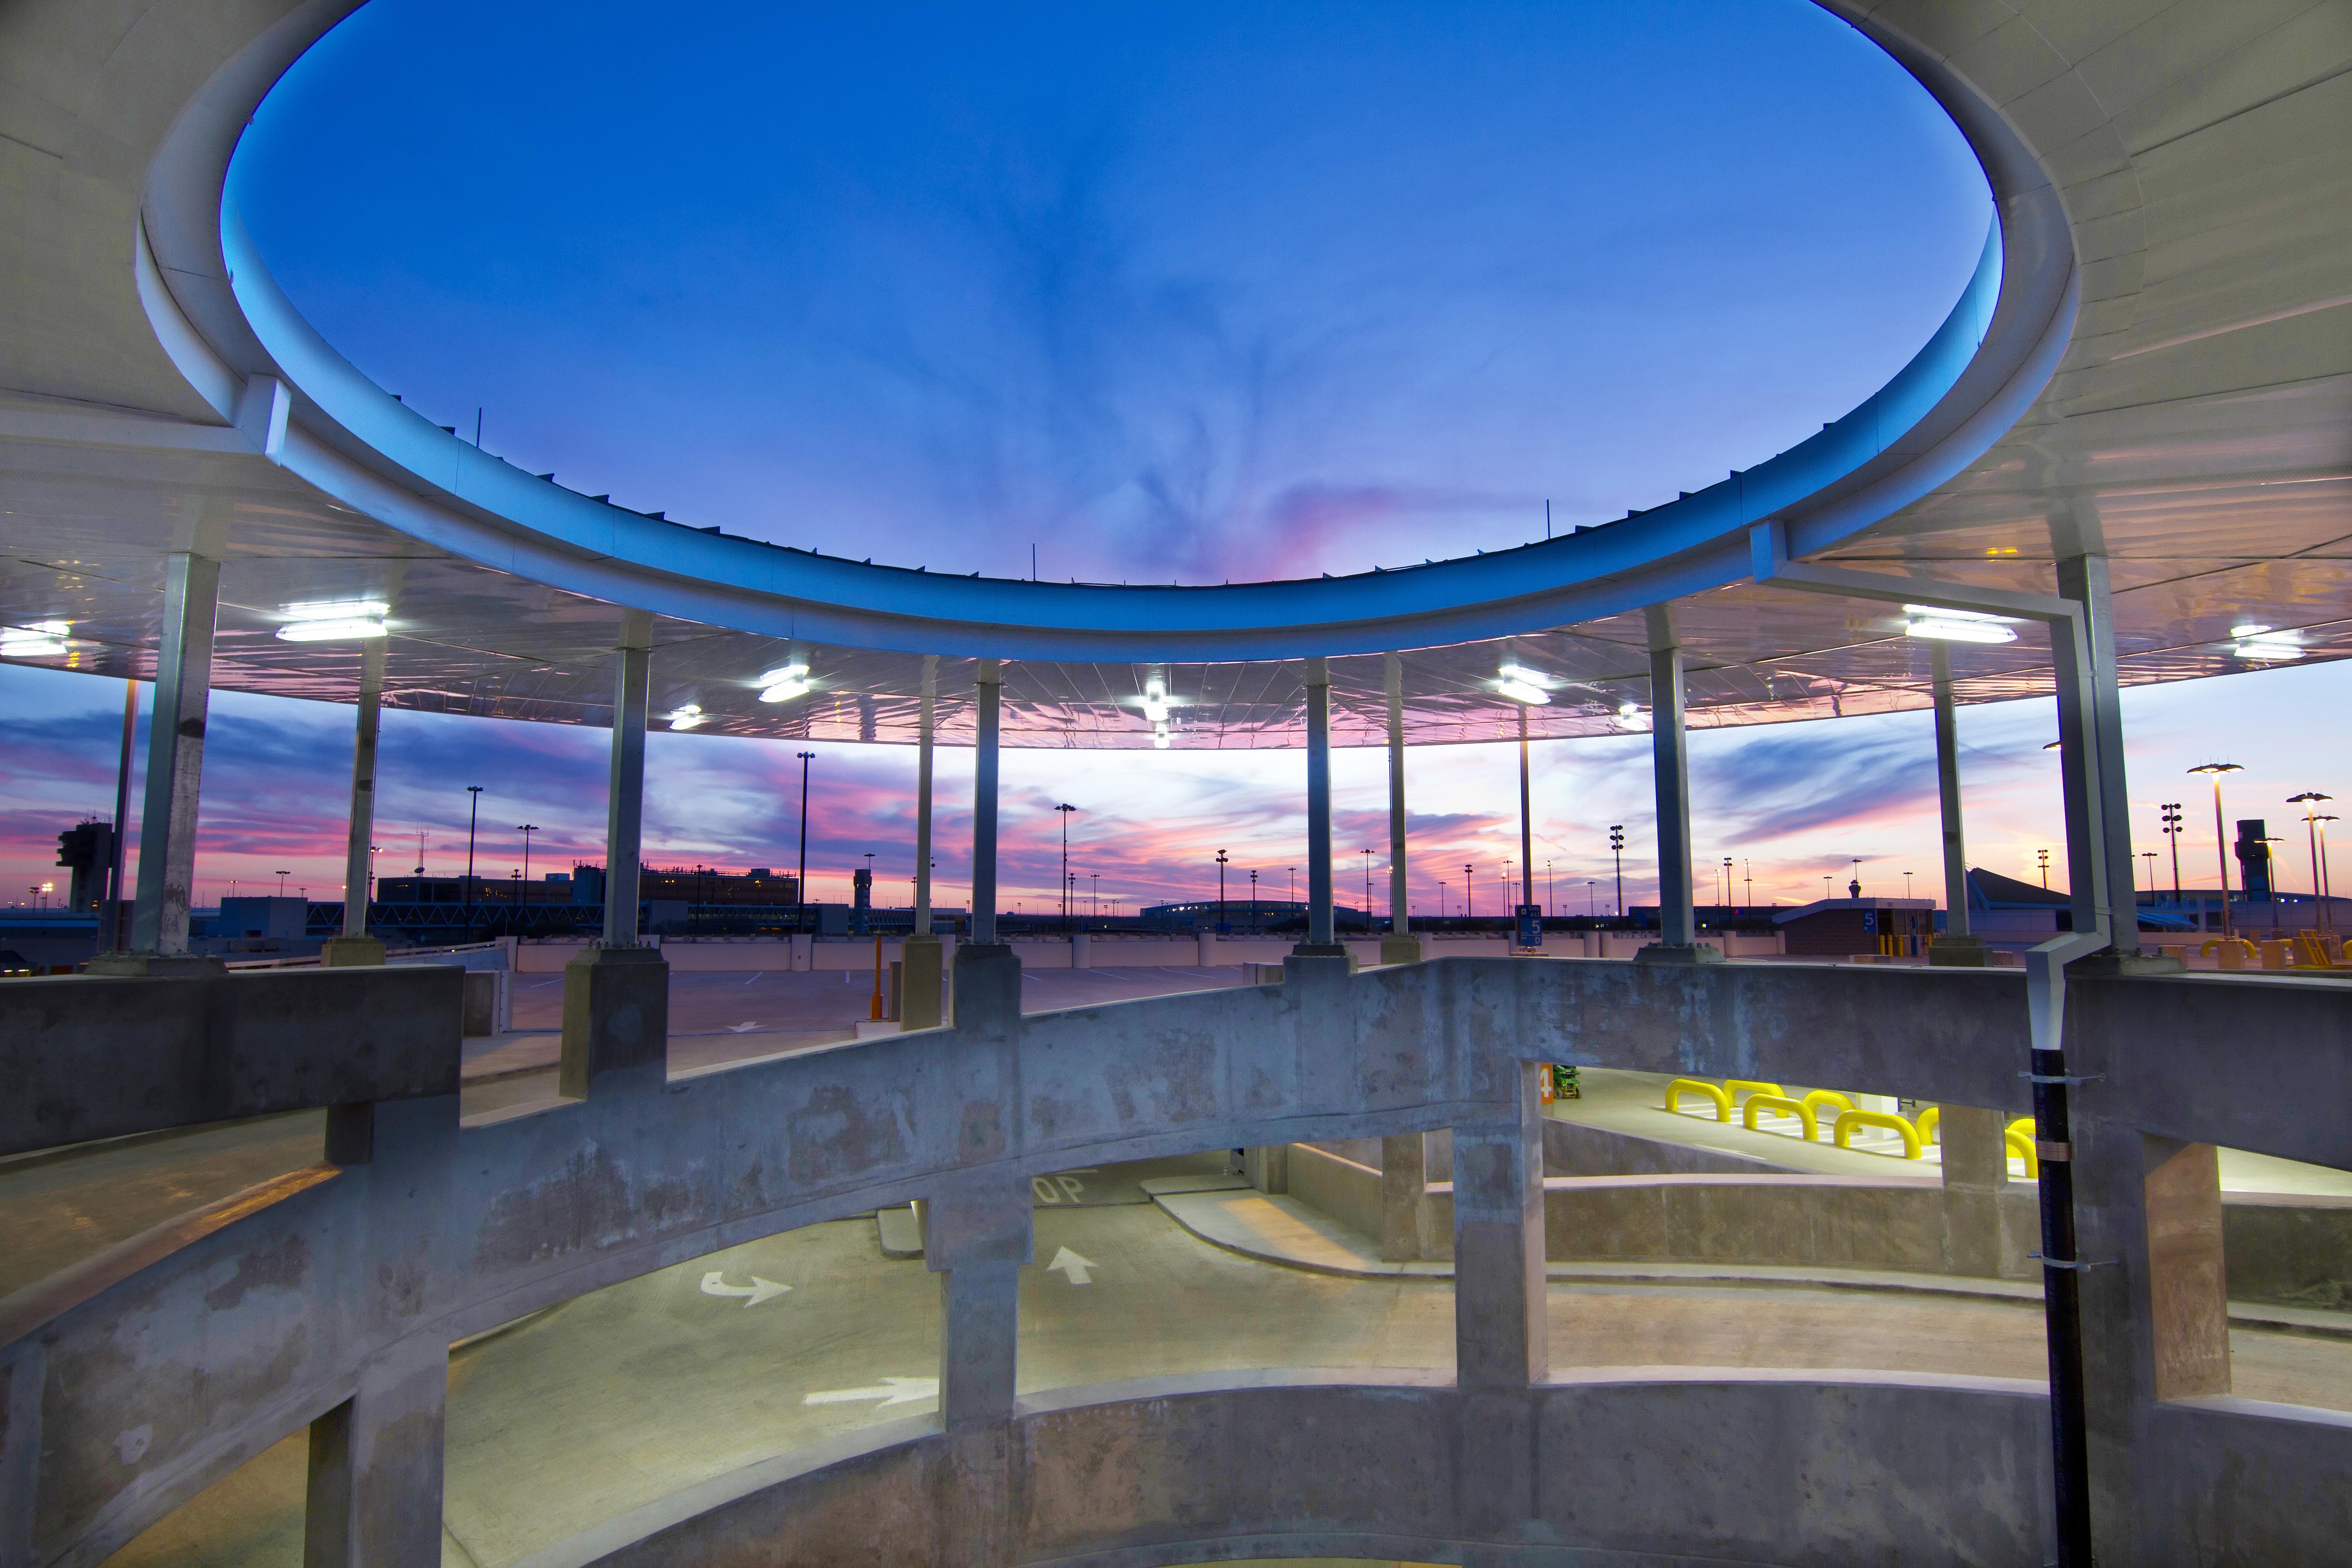 Apo Spotlight Dfw International Airport